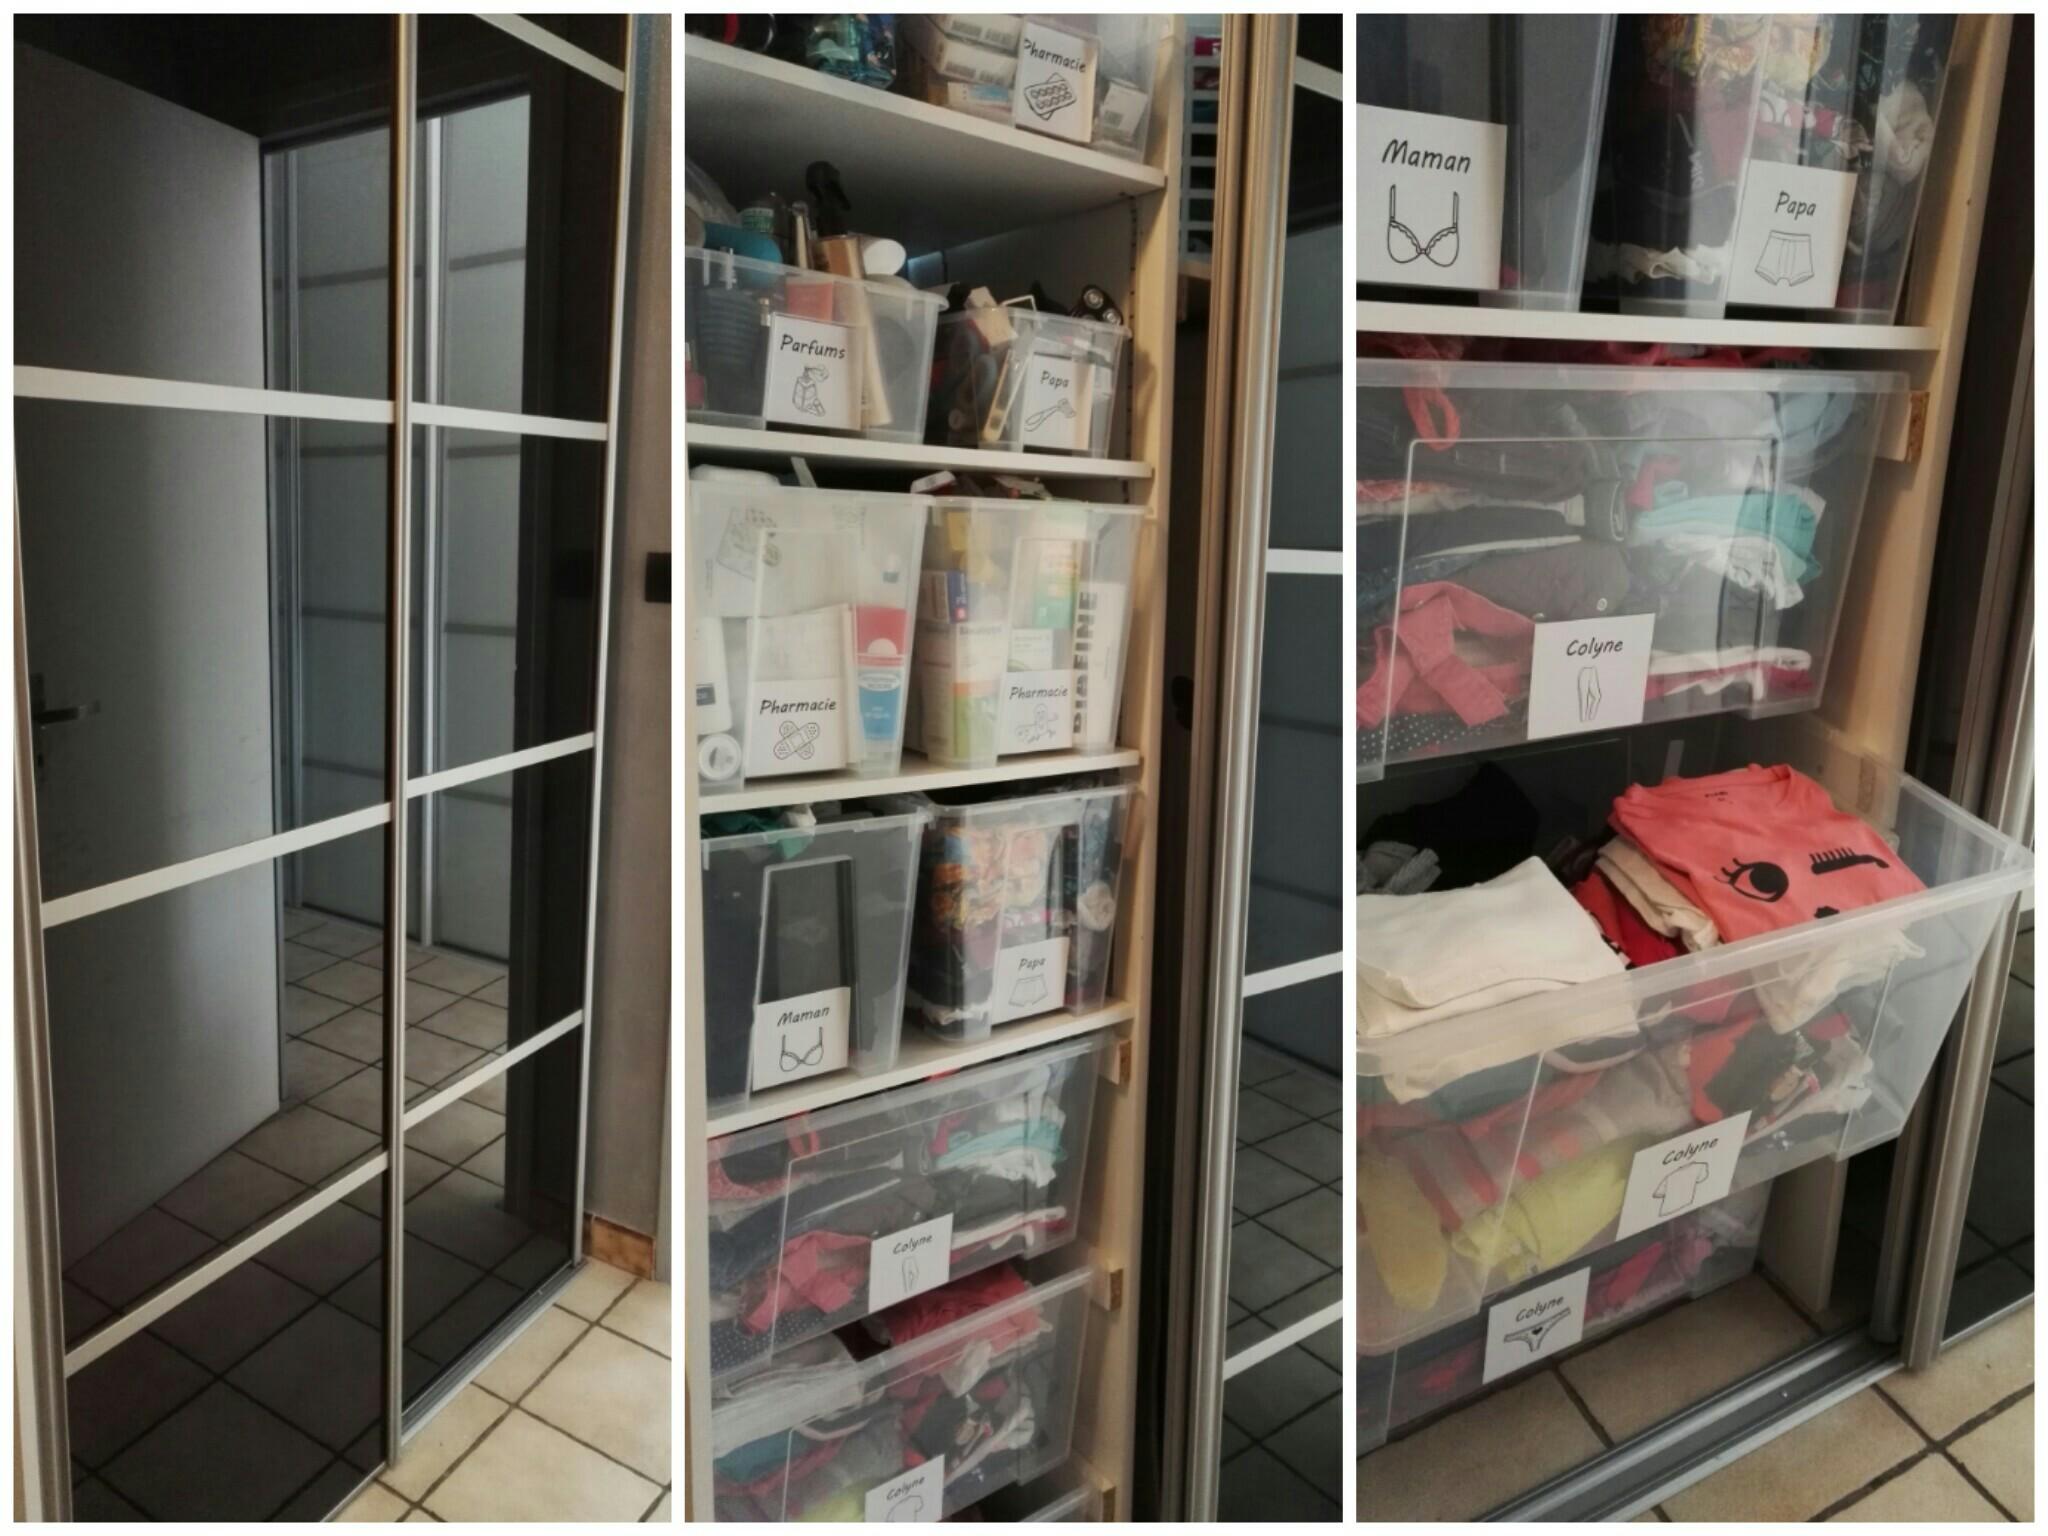 Rangement salle de bain avec des boîtes Ikea Samla